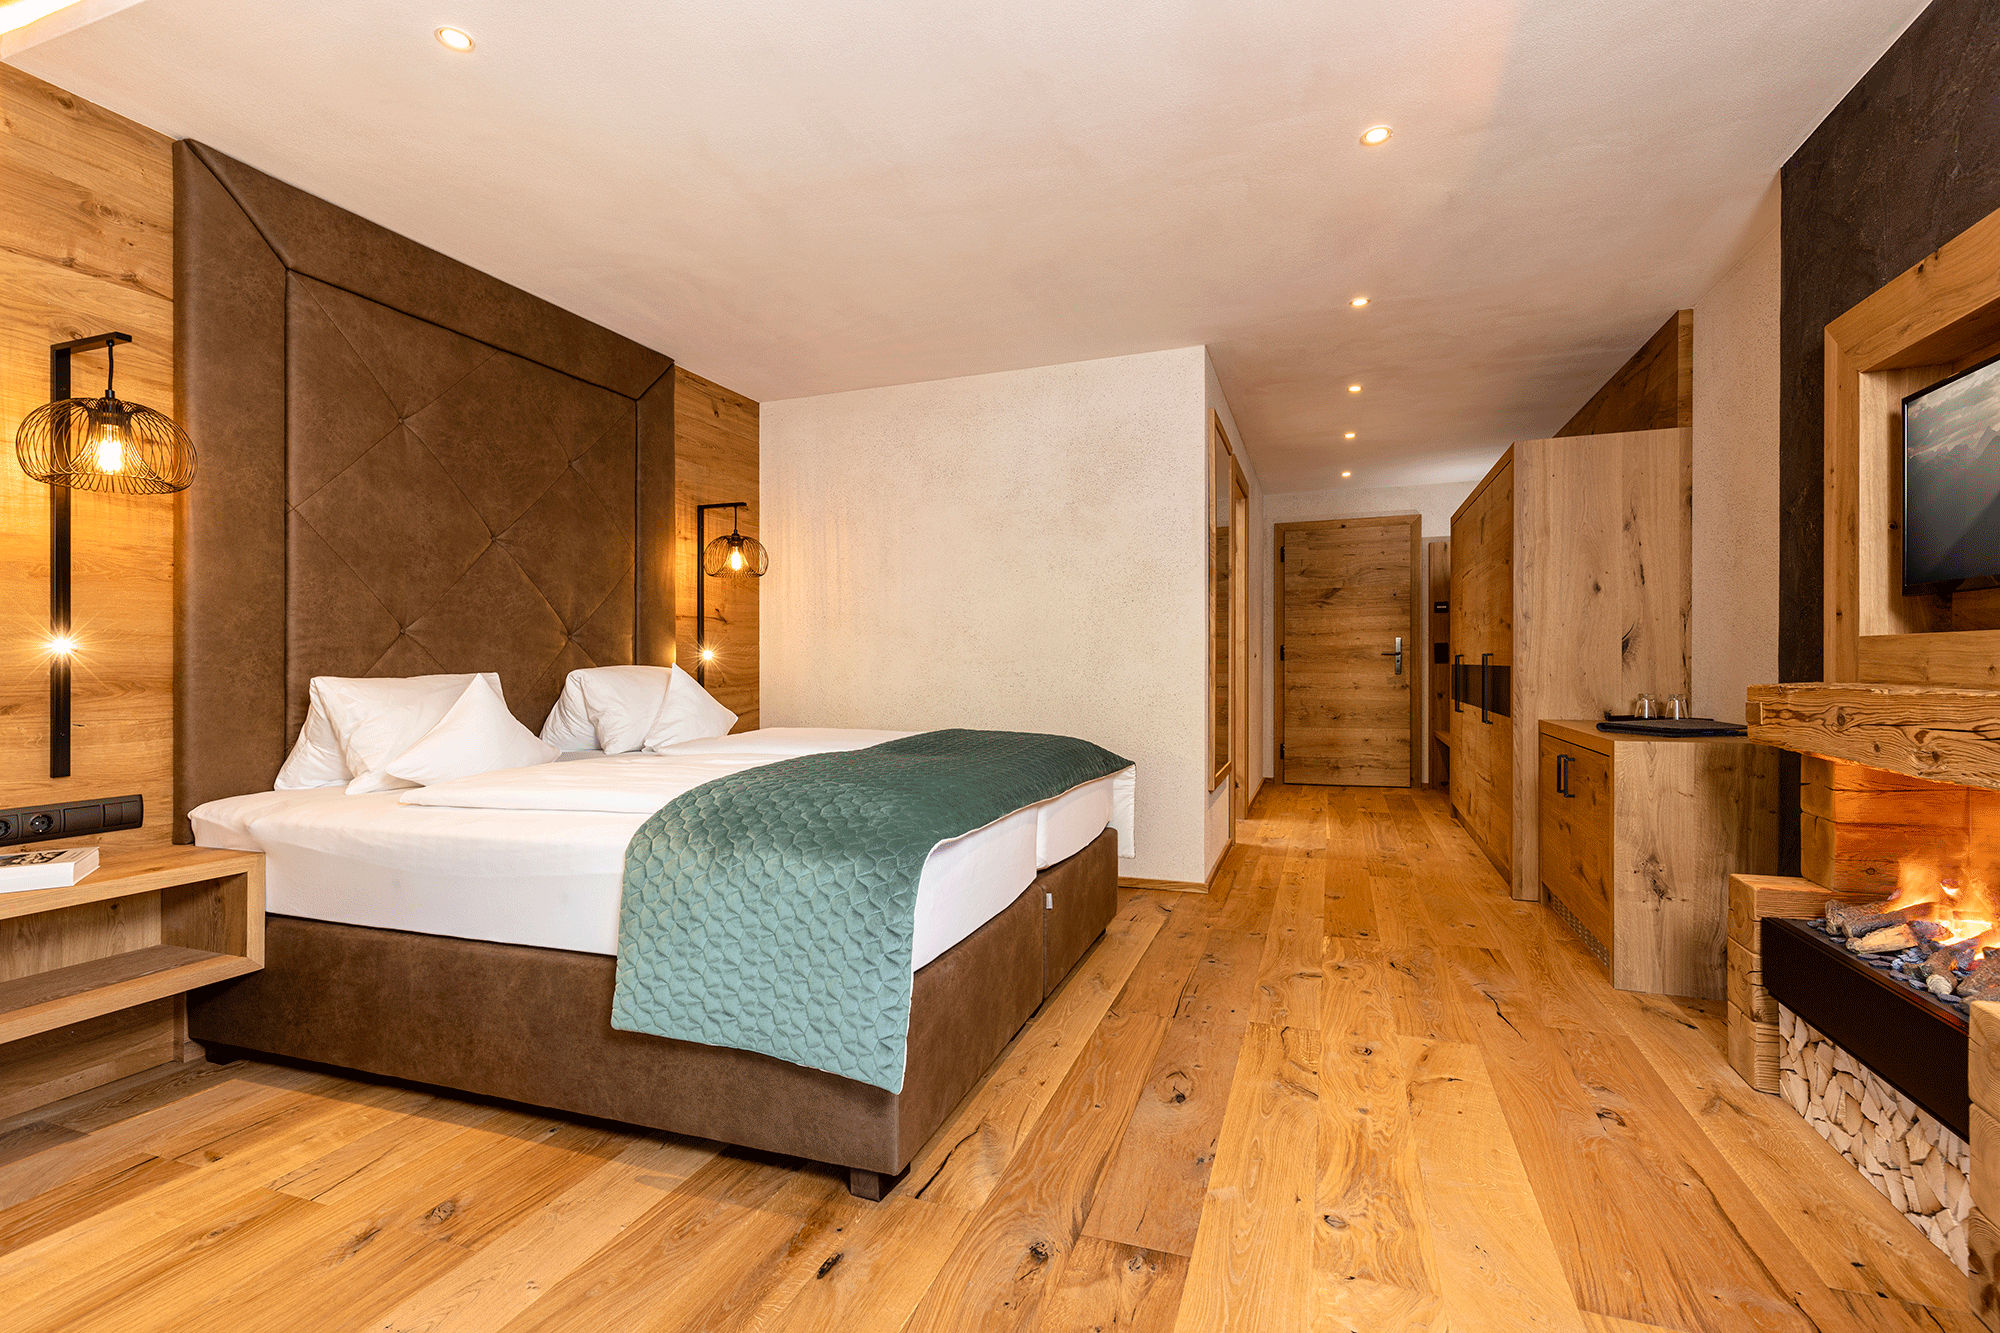 Wohnkomfortzimmer Romantik im Wellnesshotel Alpbacherhof nahe des Skigebiets Ski Juwel